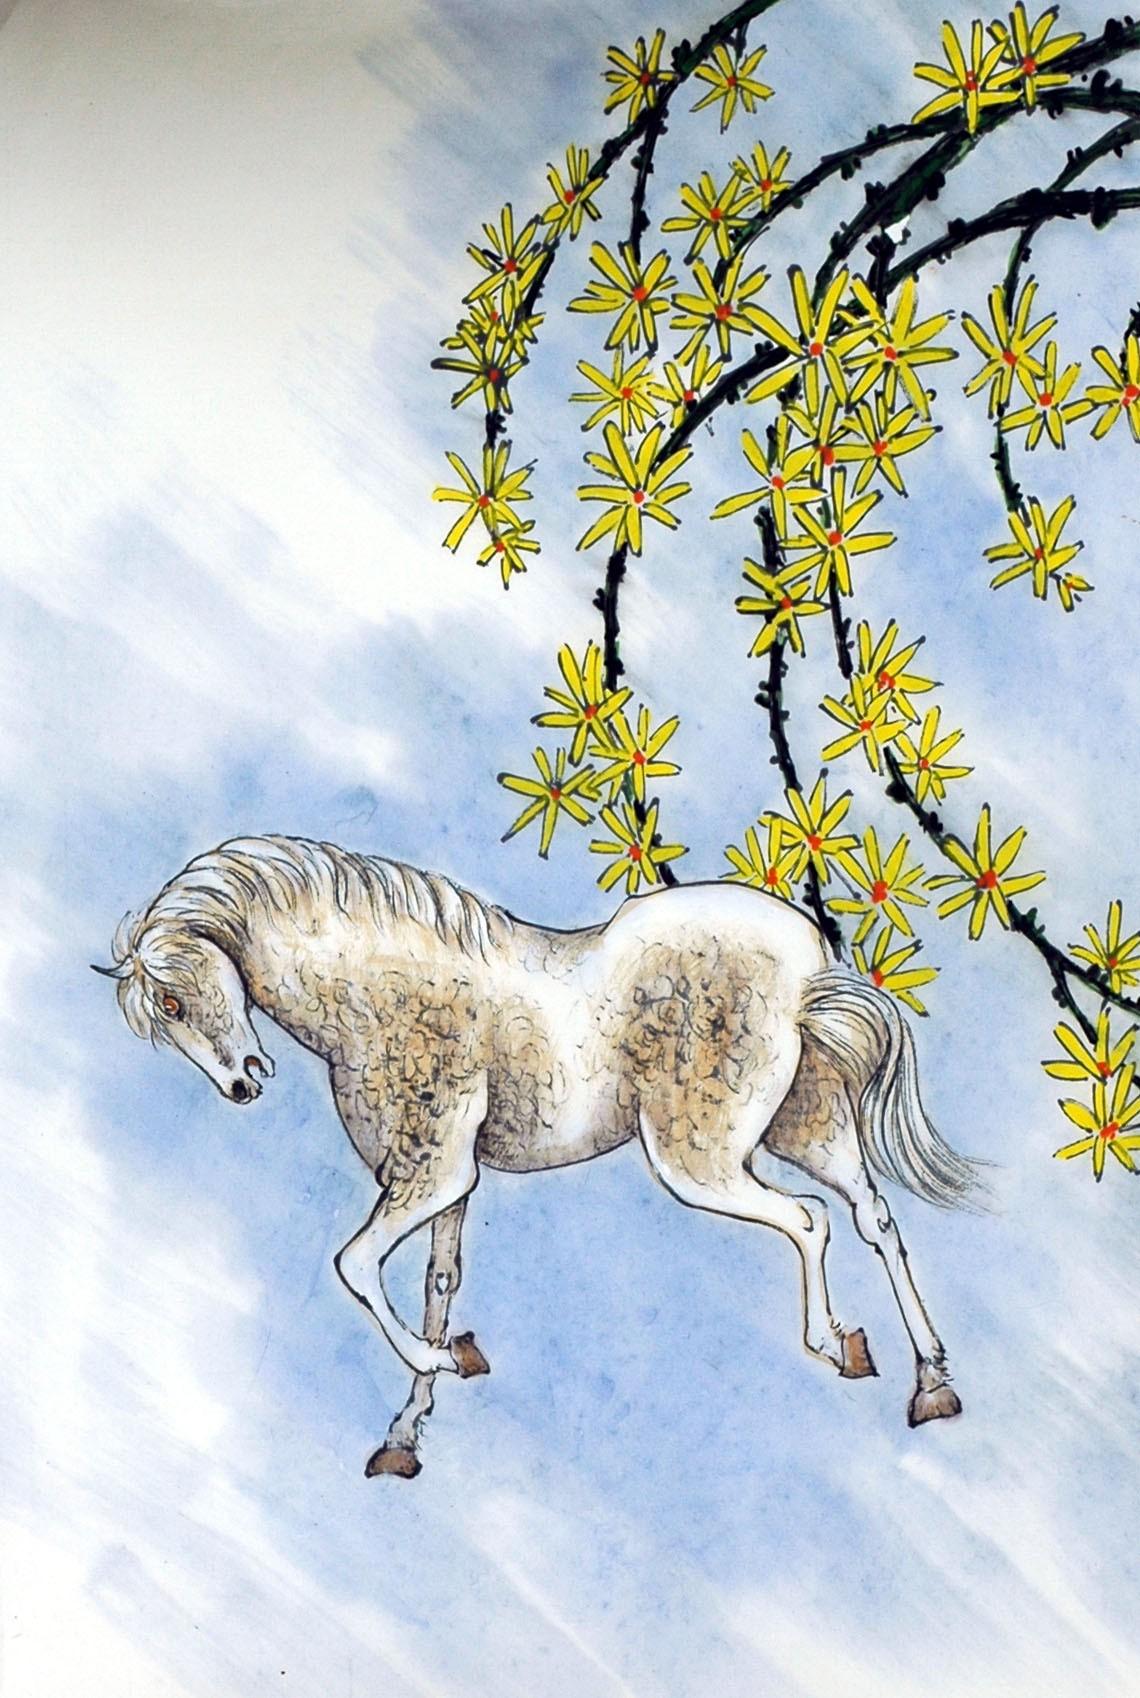 Chinese Horse Painting - CNAG007453